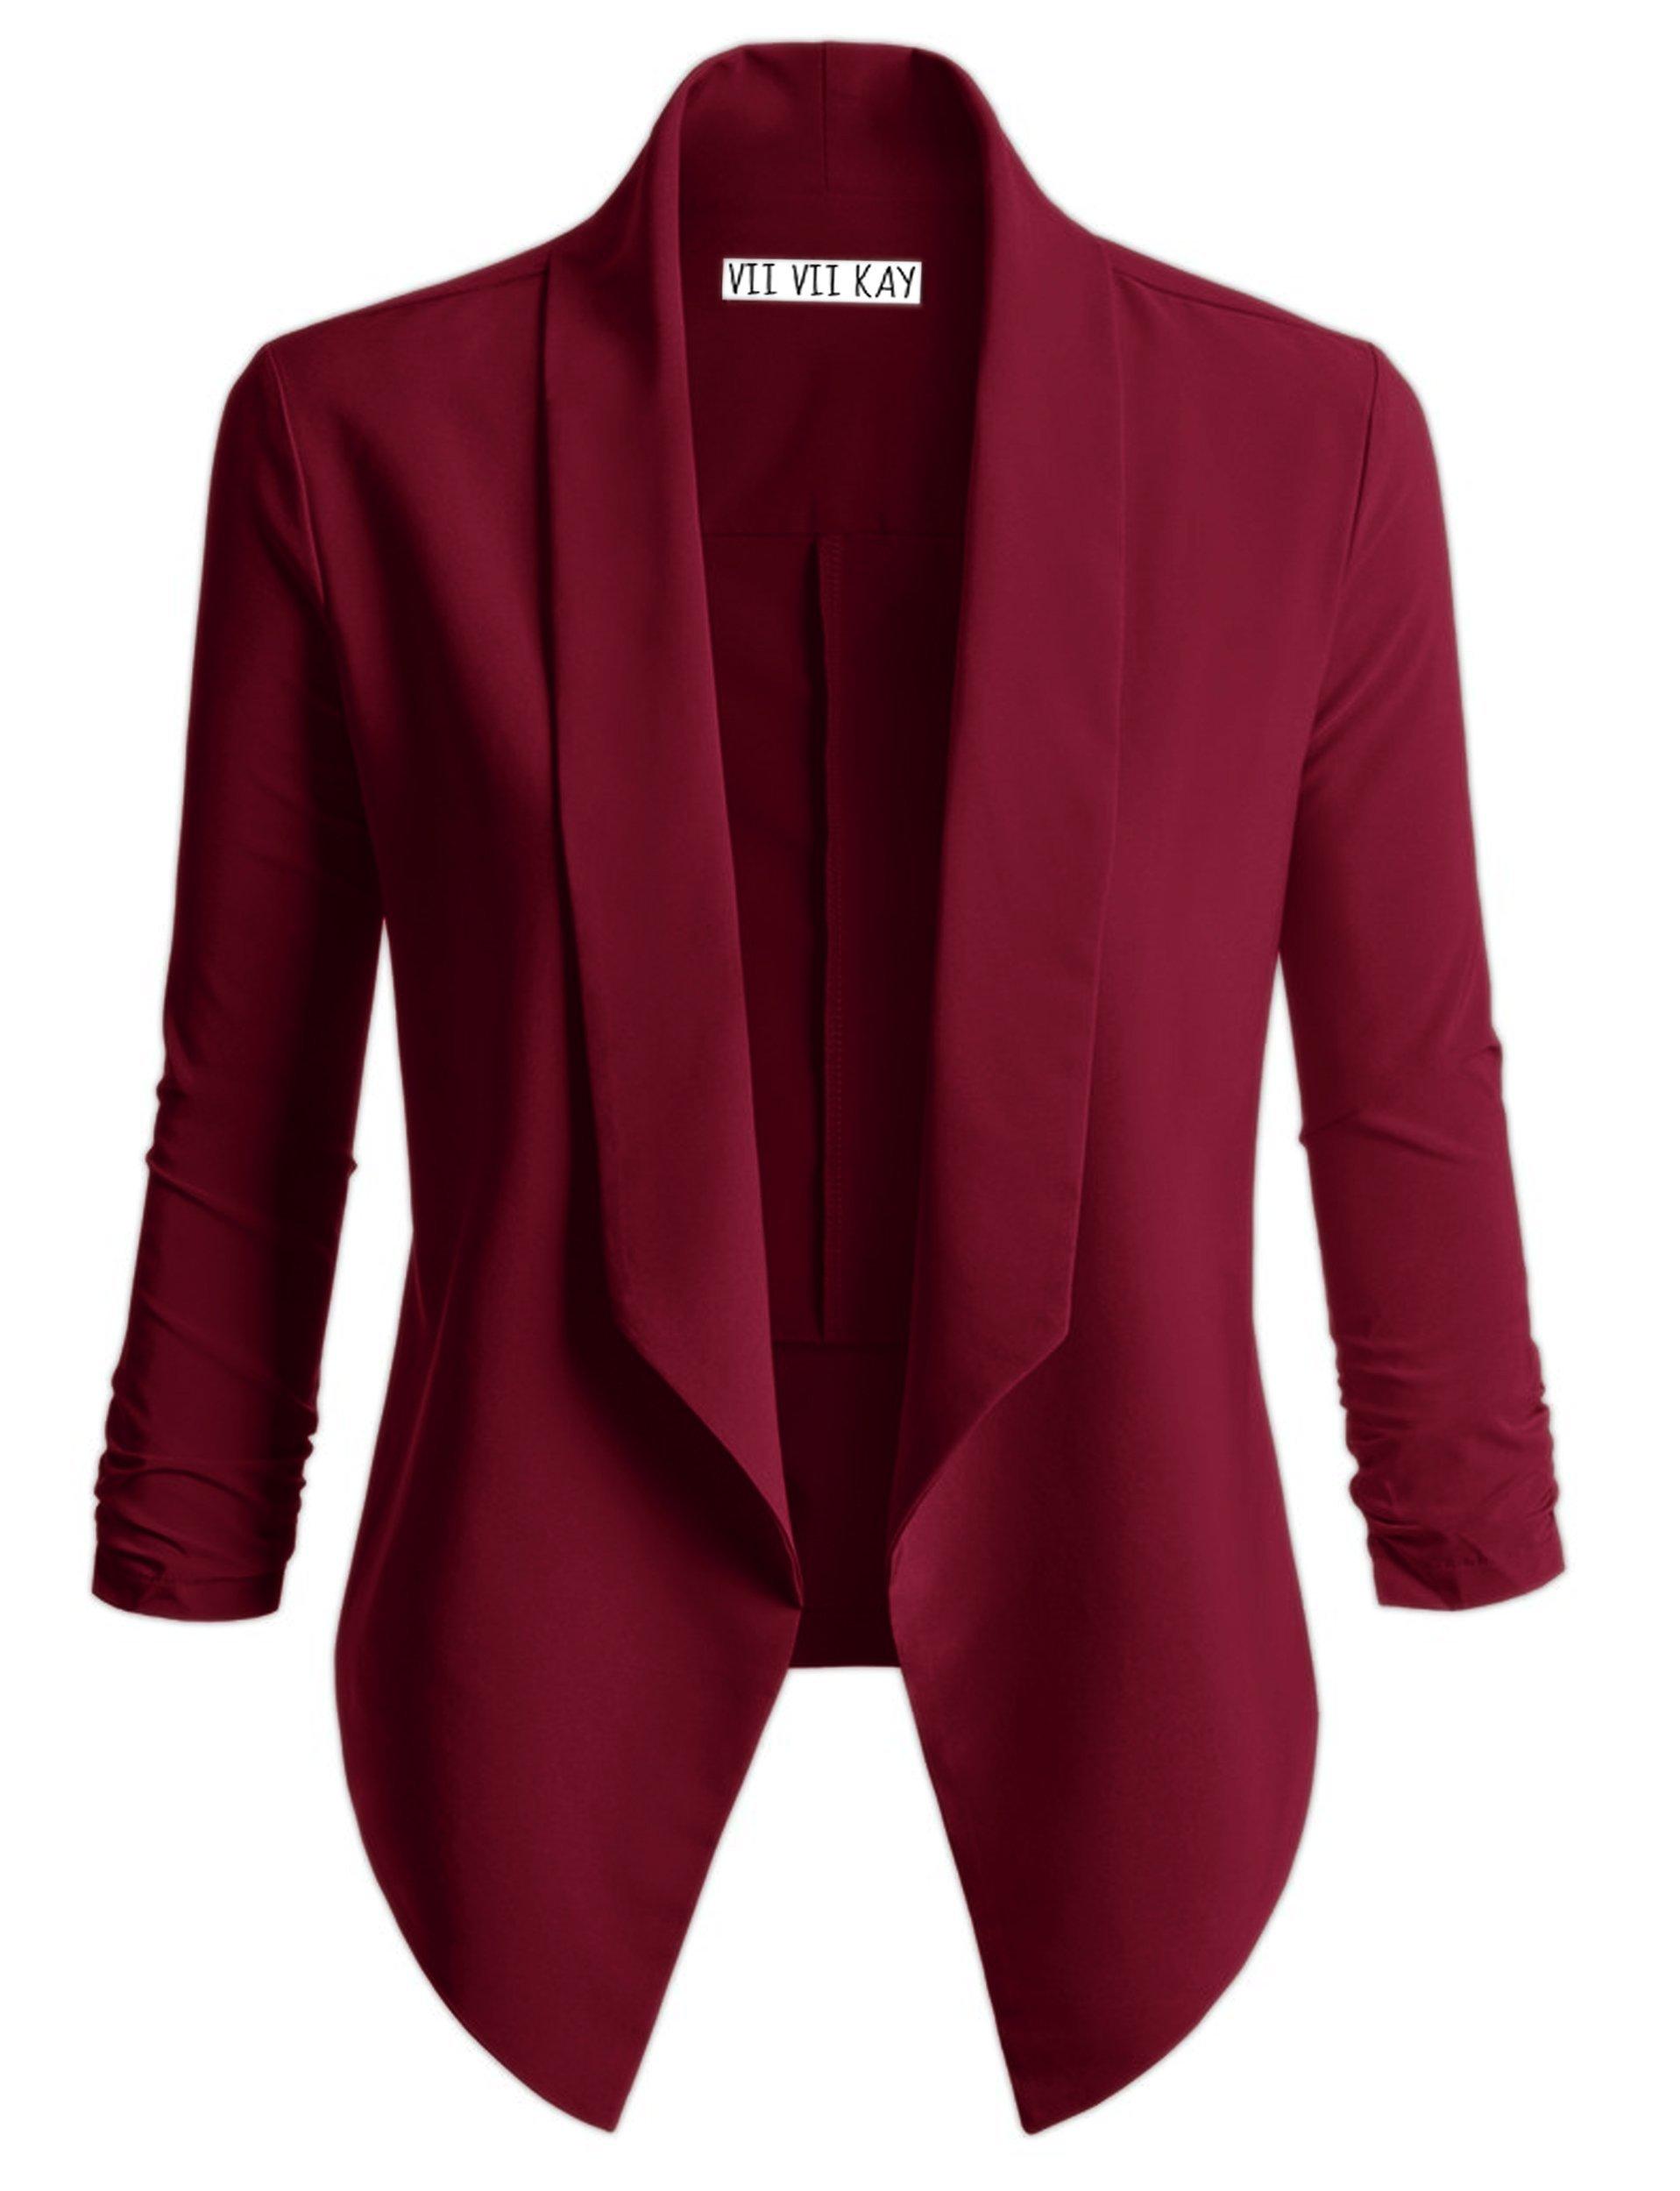 ViiViiKay Women's Versatile Business Attire Blazers In Multiple Styles 37_Burgundy XL